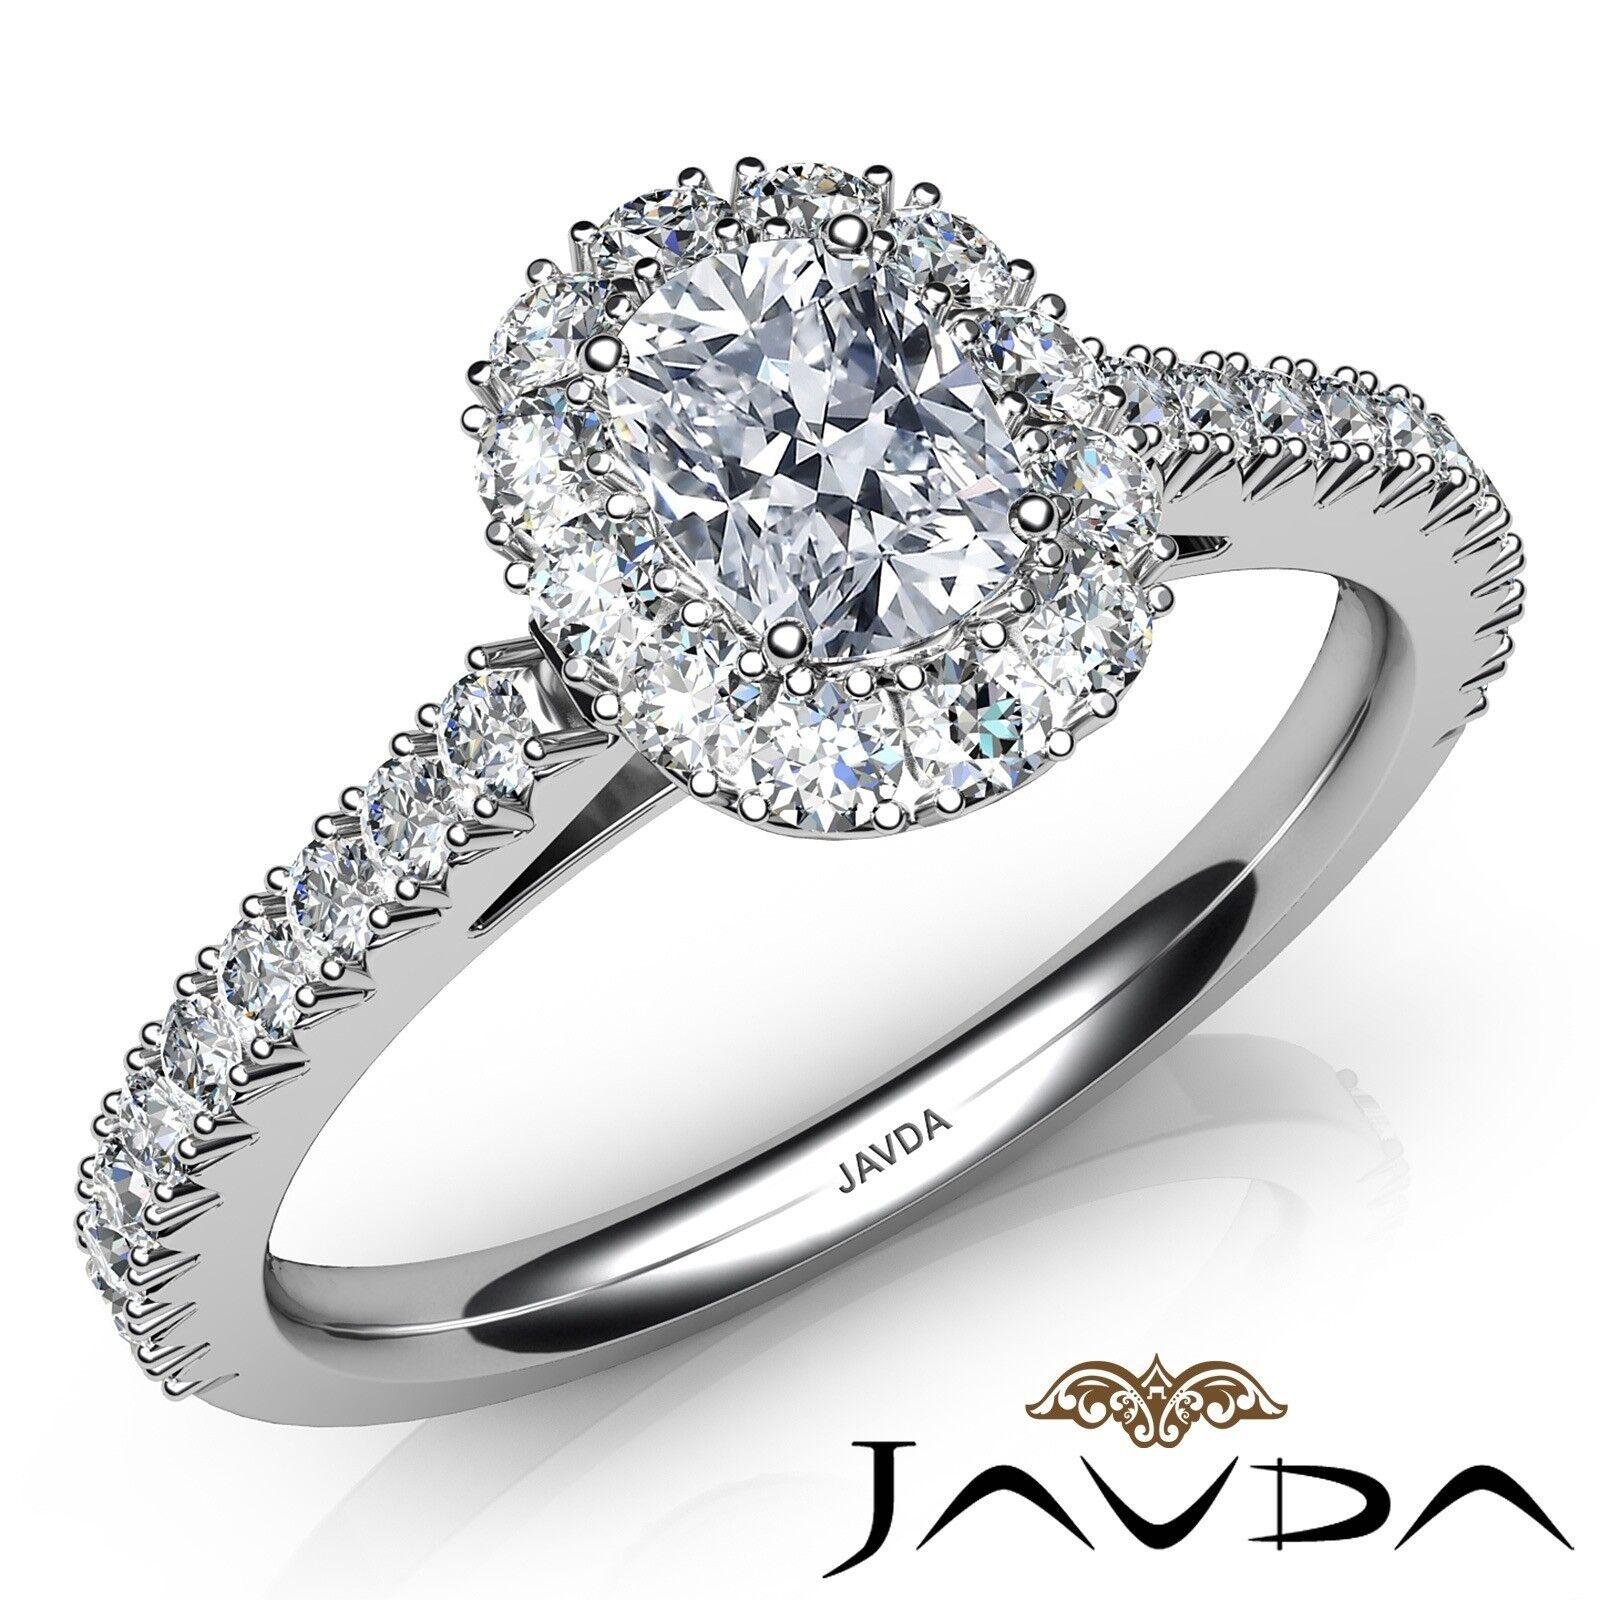 1.52ct French Pave set Halo Cushion Diamond Engagement Ring GIA F-VS1 White Gold